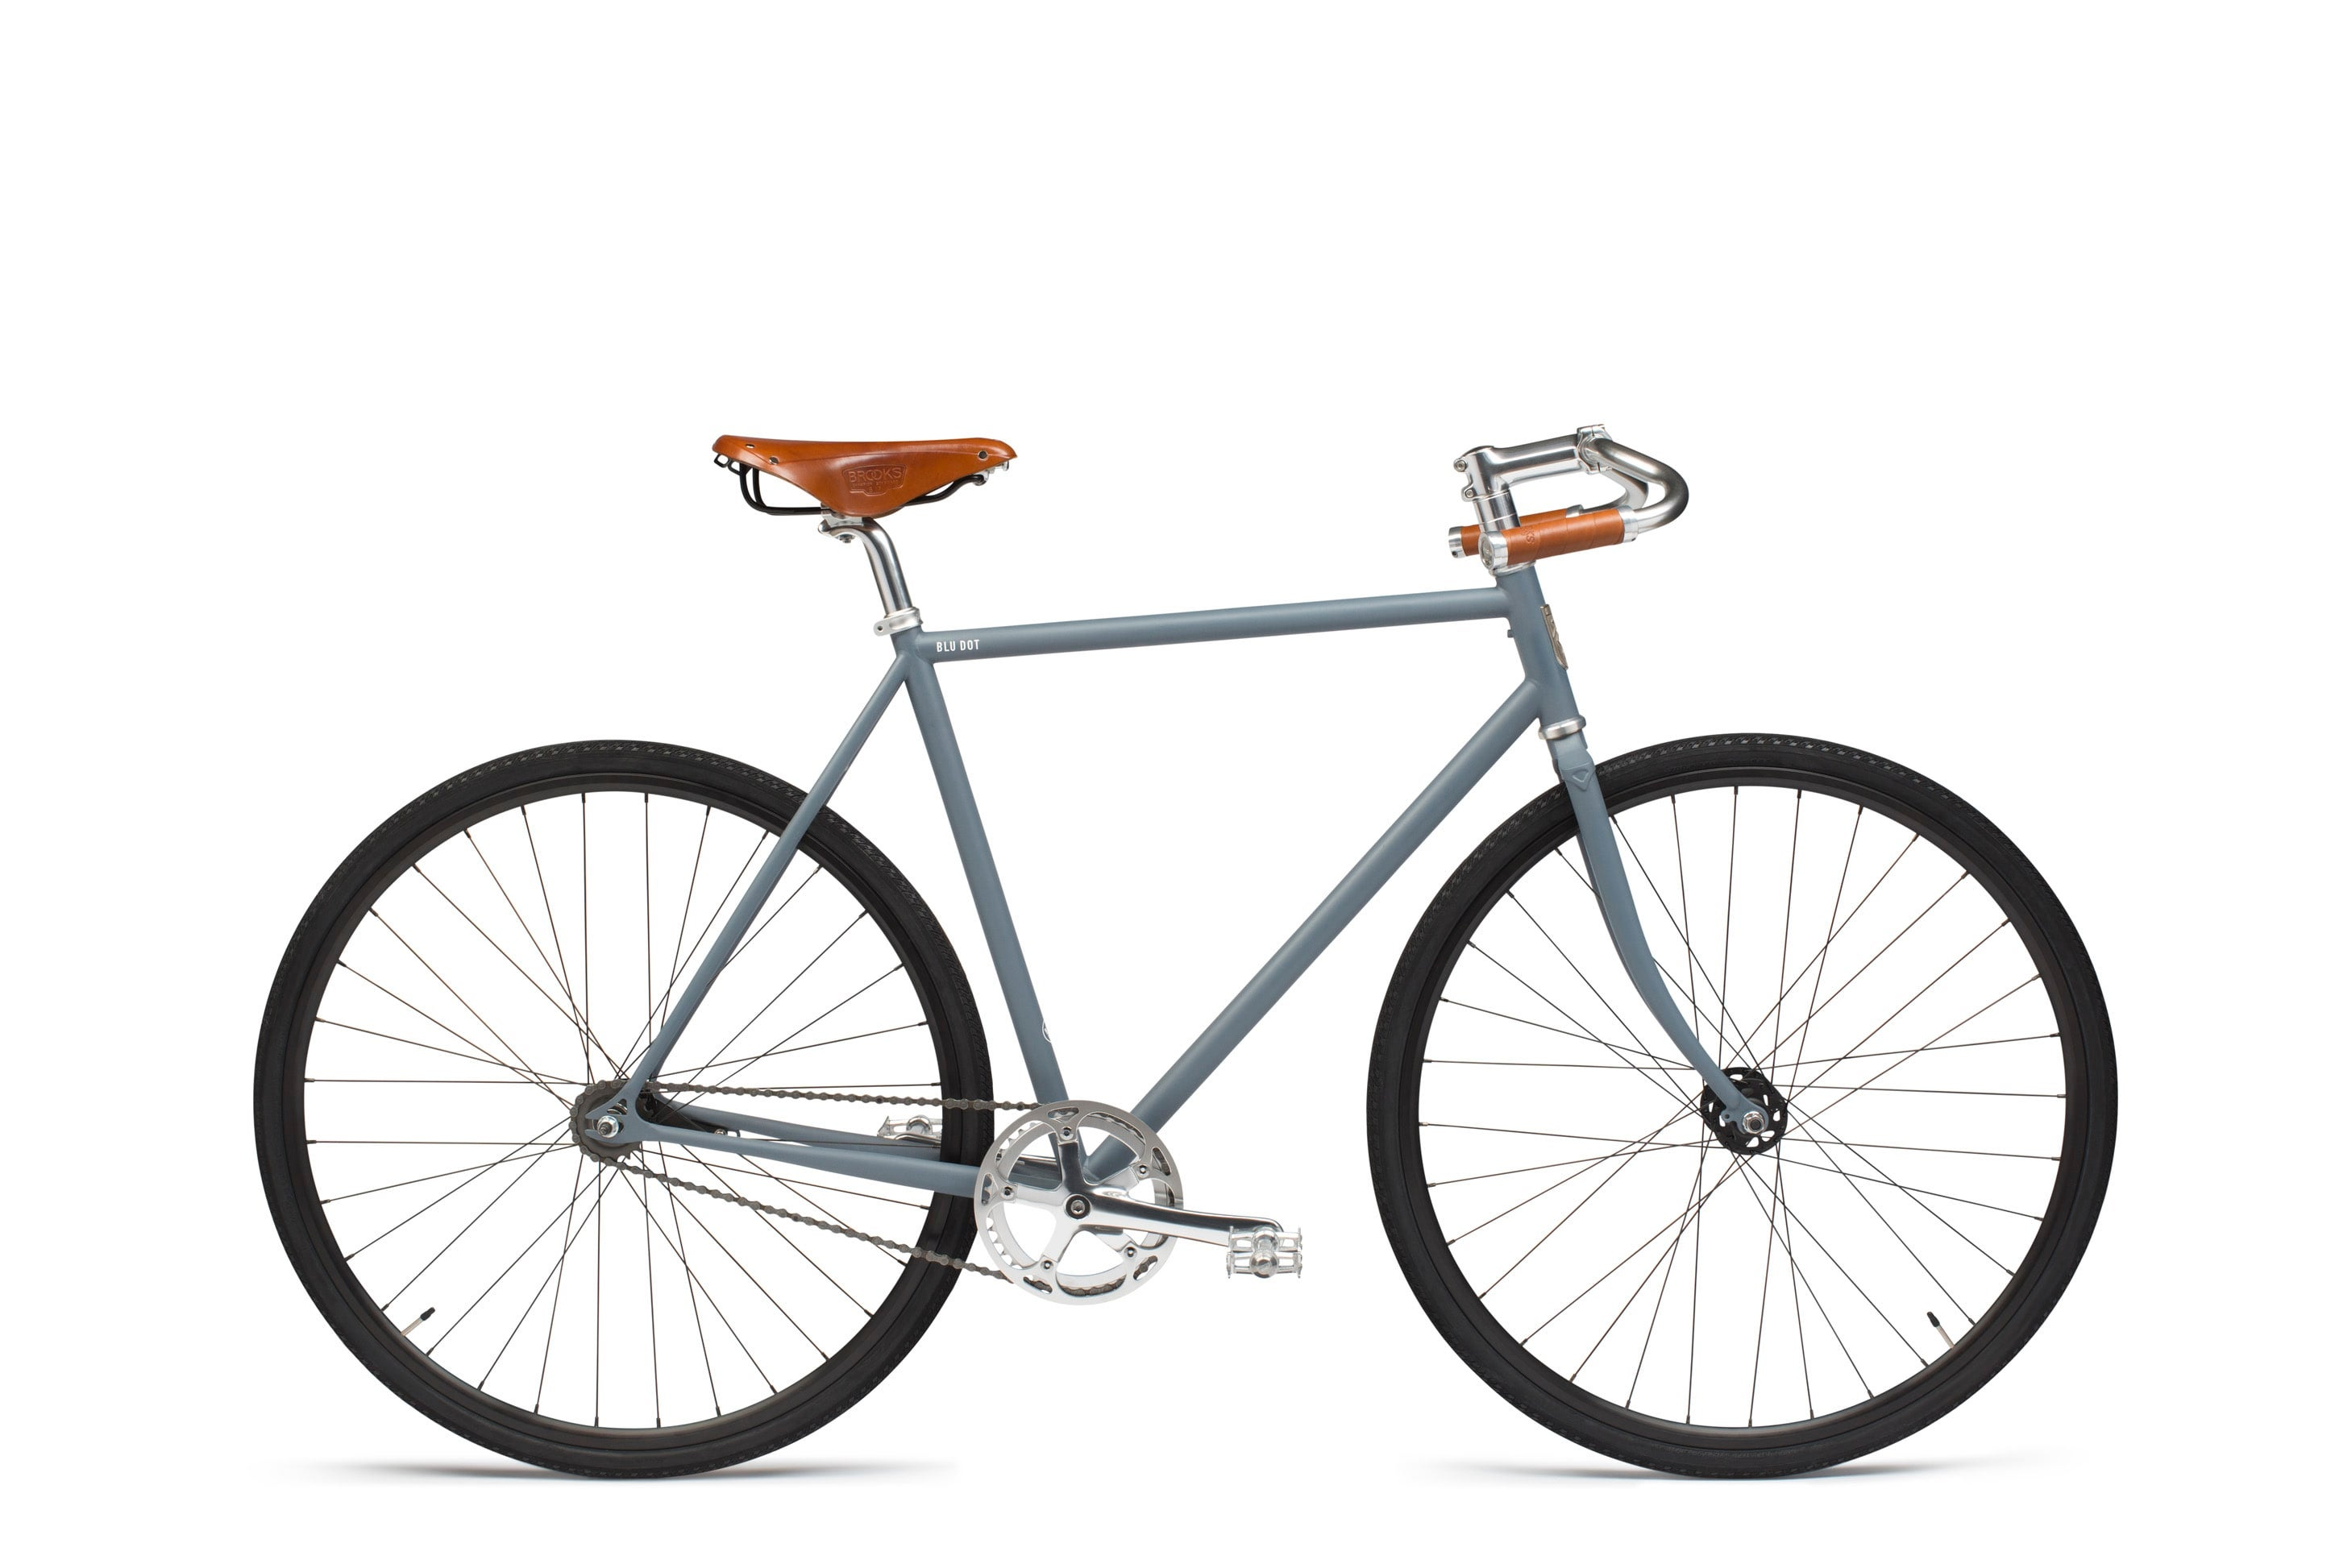 bludot_x_handsome_bike_1926_3